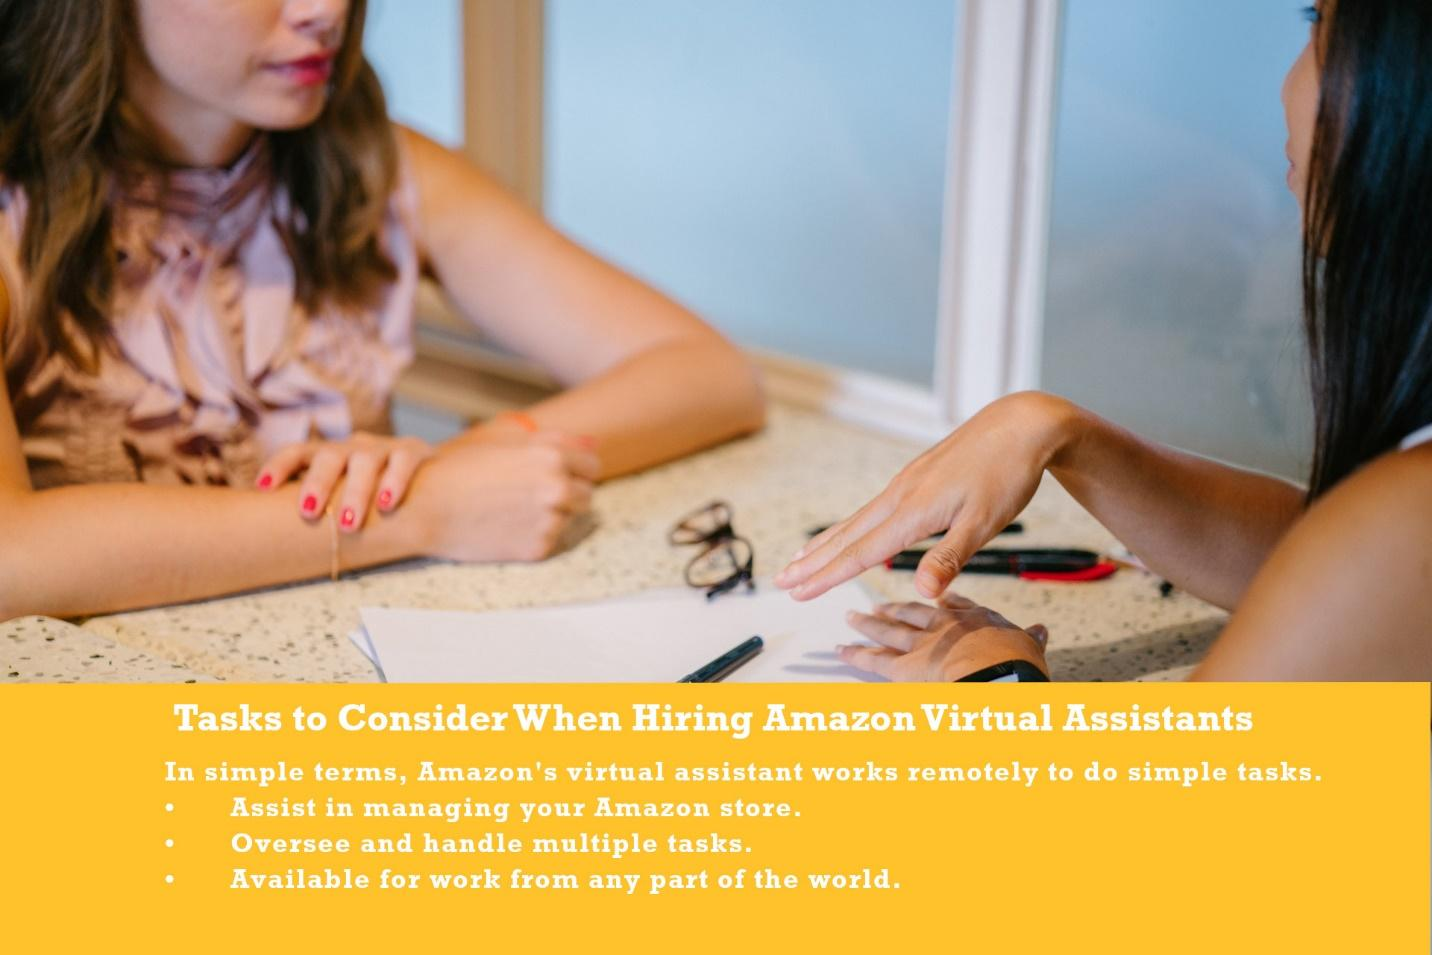 D:\AmazinEcommerce New Folder\dailytechquest.com images\3. How to hire amazon FBA virtual assistant.jpg